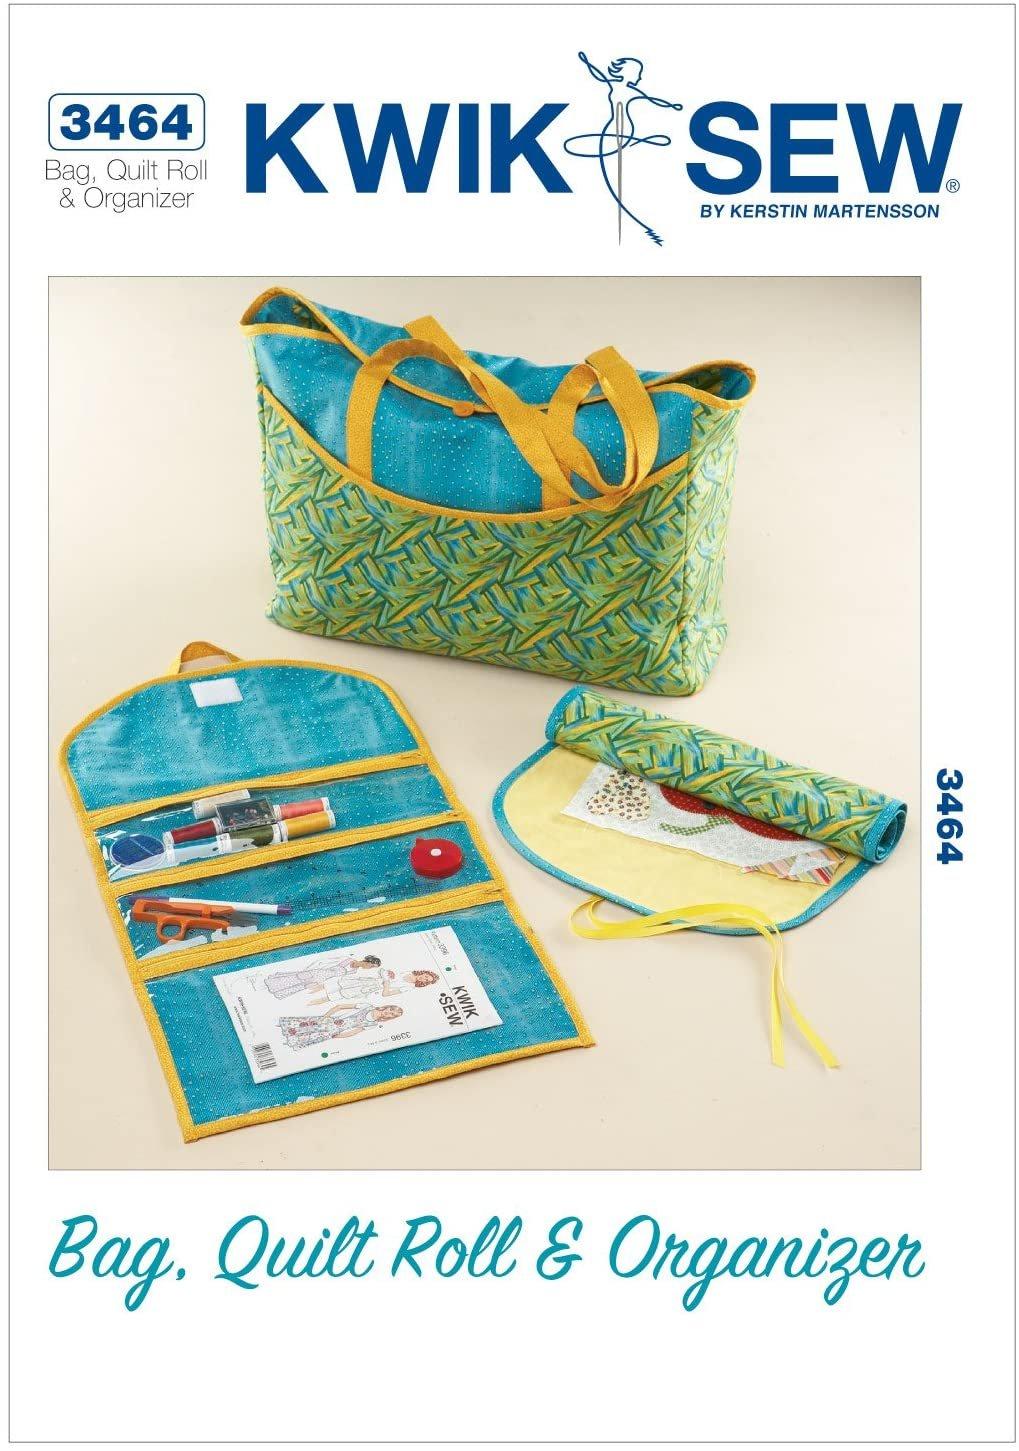 Bag, Quilt Roll & Organizer